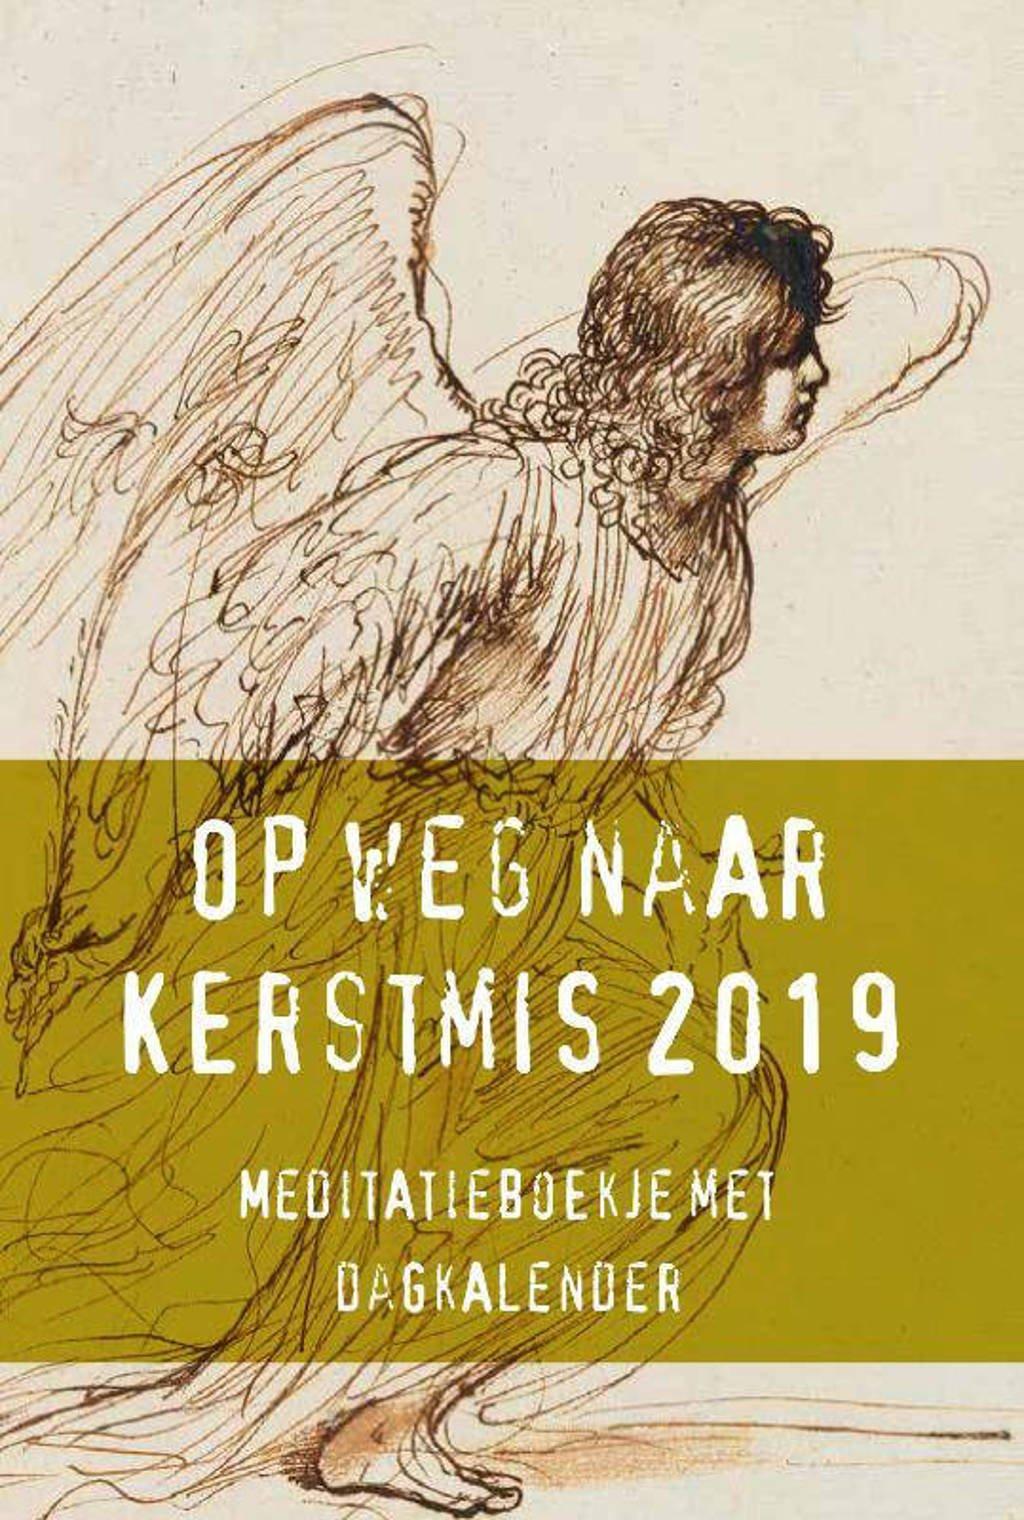 Op weg naar Kerstmis 2019 - René Hornikx en Lisette Hornikx-Janssen